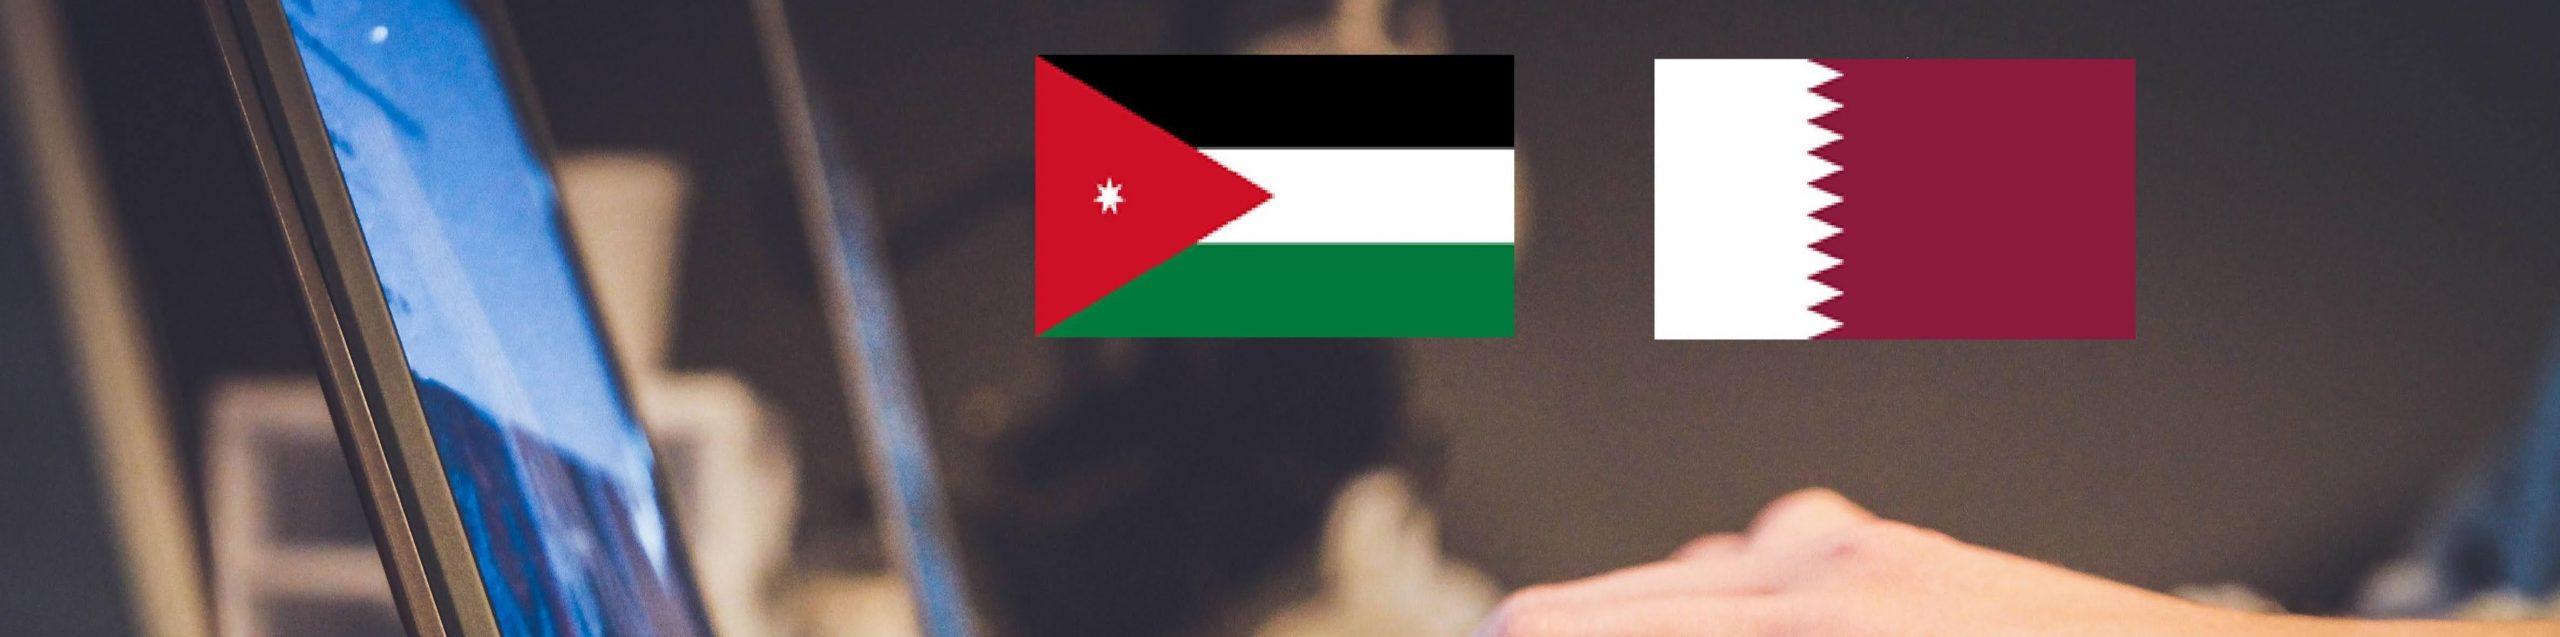 4o Webinar: Doing Business with the Arab World